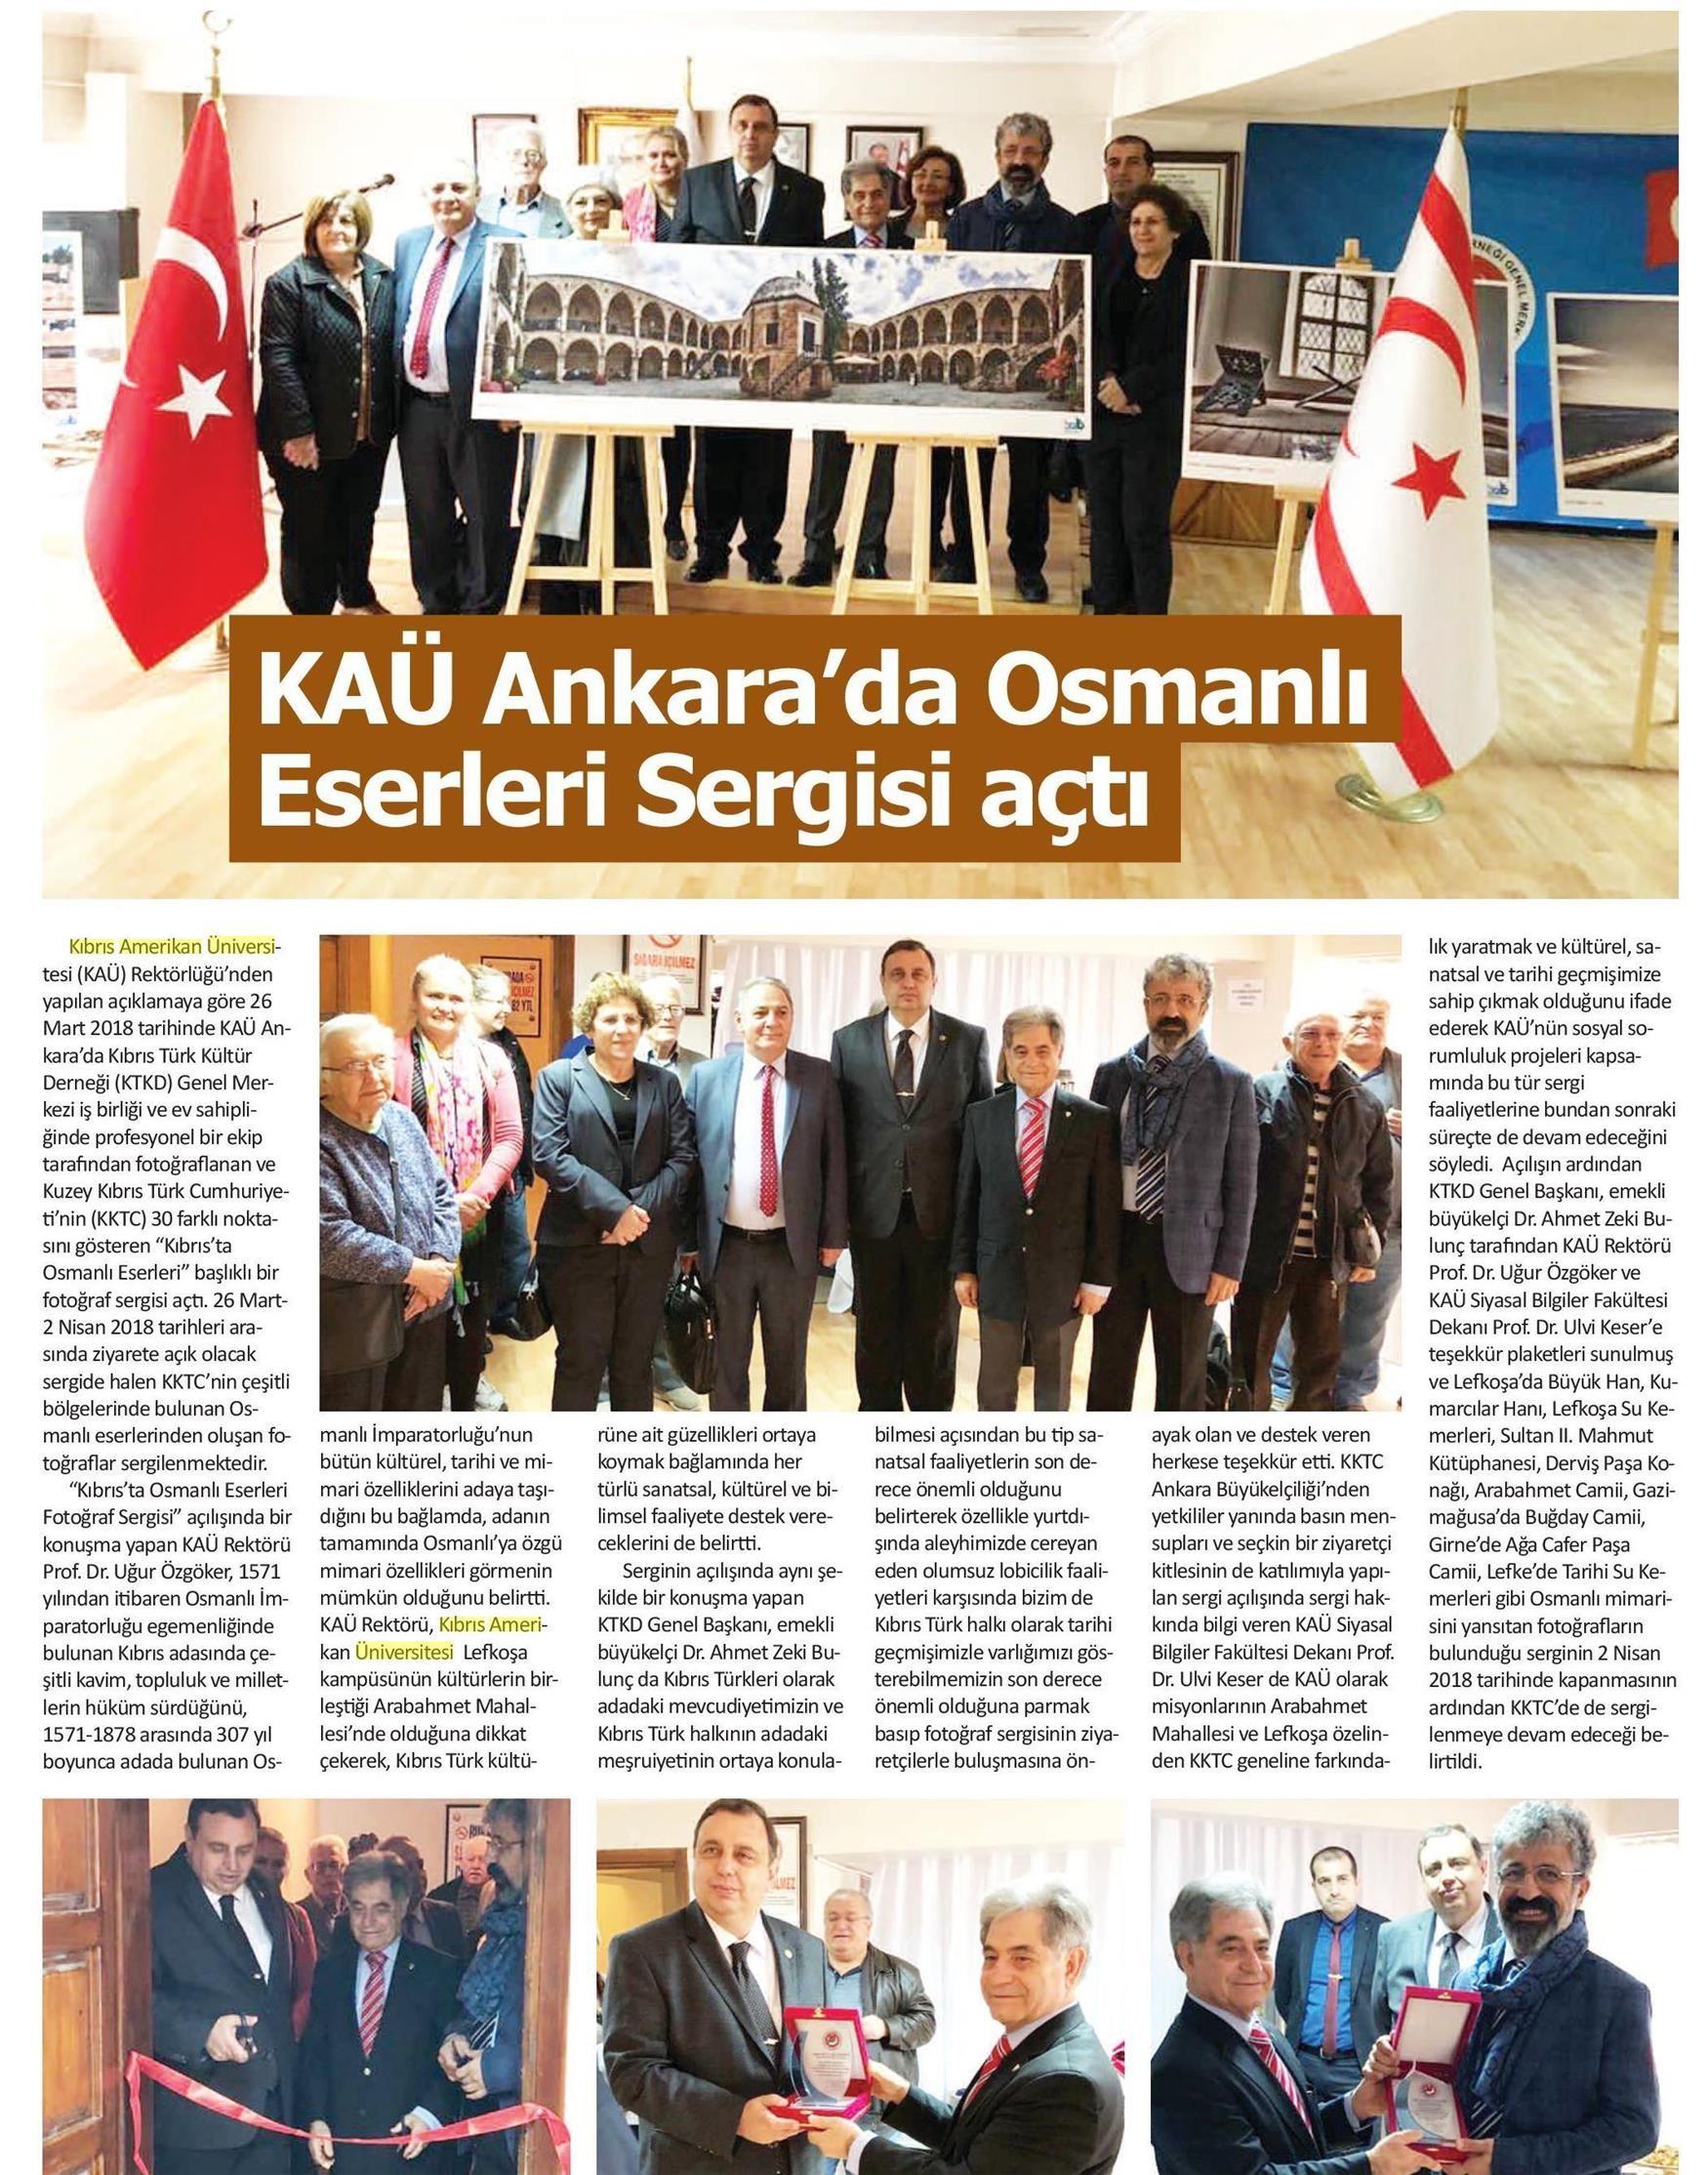 Kau Ankara 39 Da Osmanli Eserleri Sergisi Acti Kibris Amerikan Universitesi Kau Rektorlugu 39 Nden Yapil Kultur Cografya Egitim